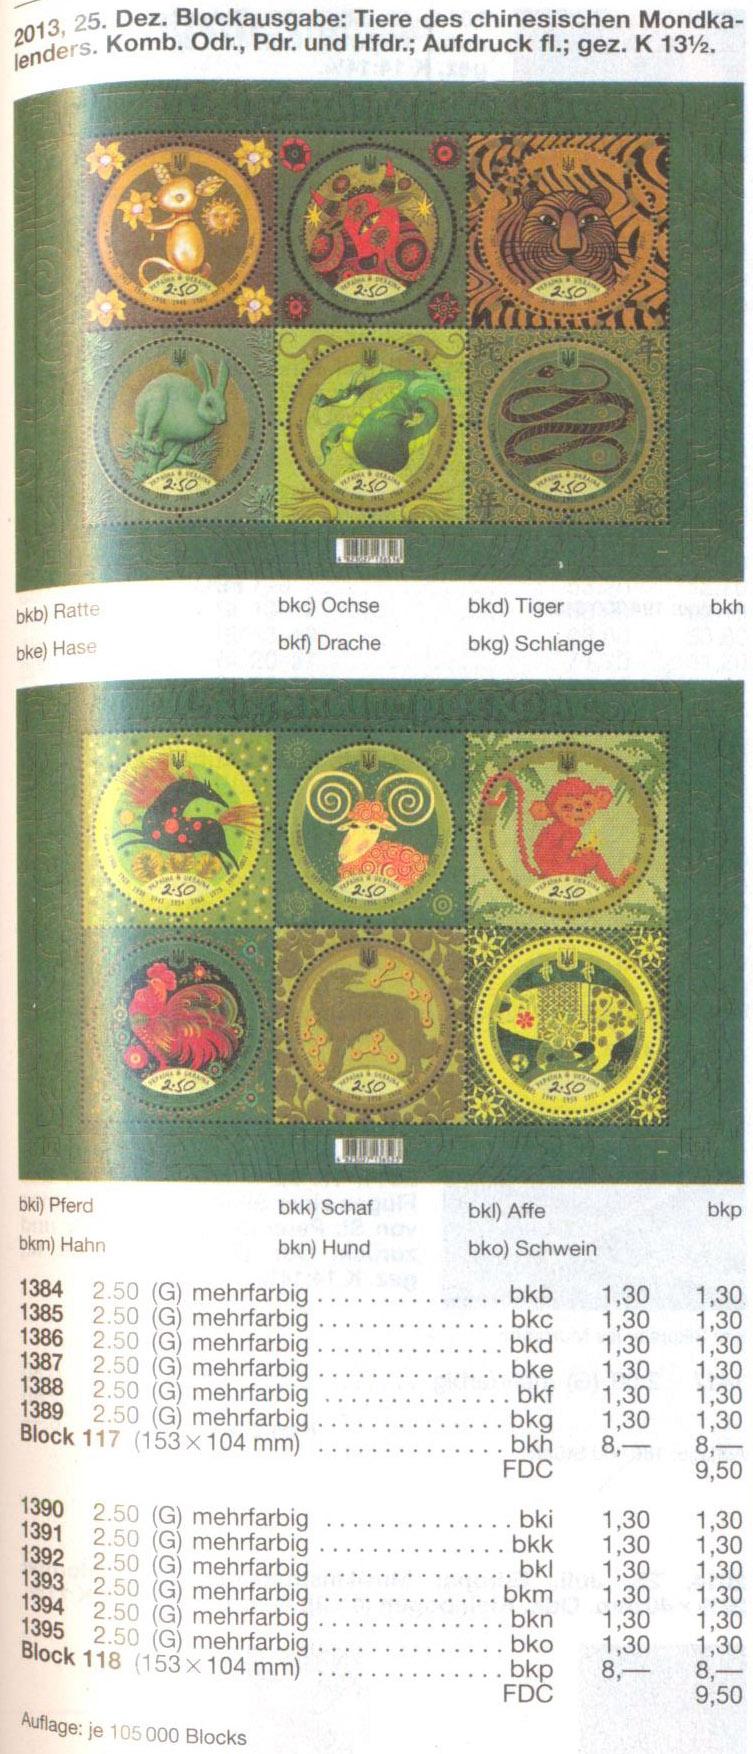 N1390-1395 (block118) каталог 2013 блок Гороскоп от коня до свиньи